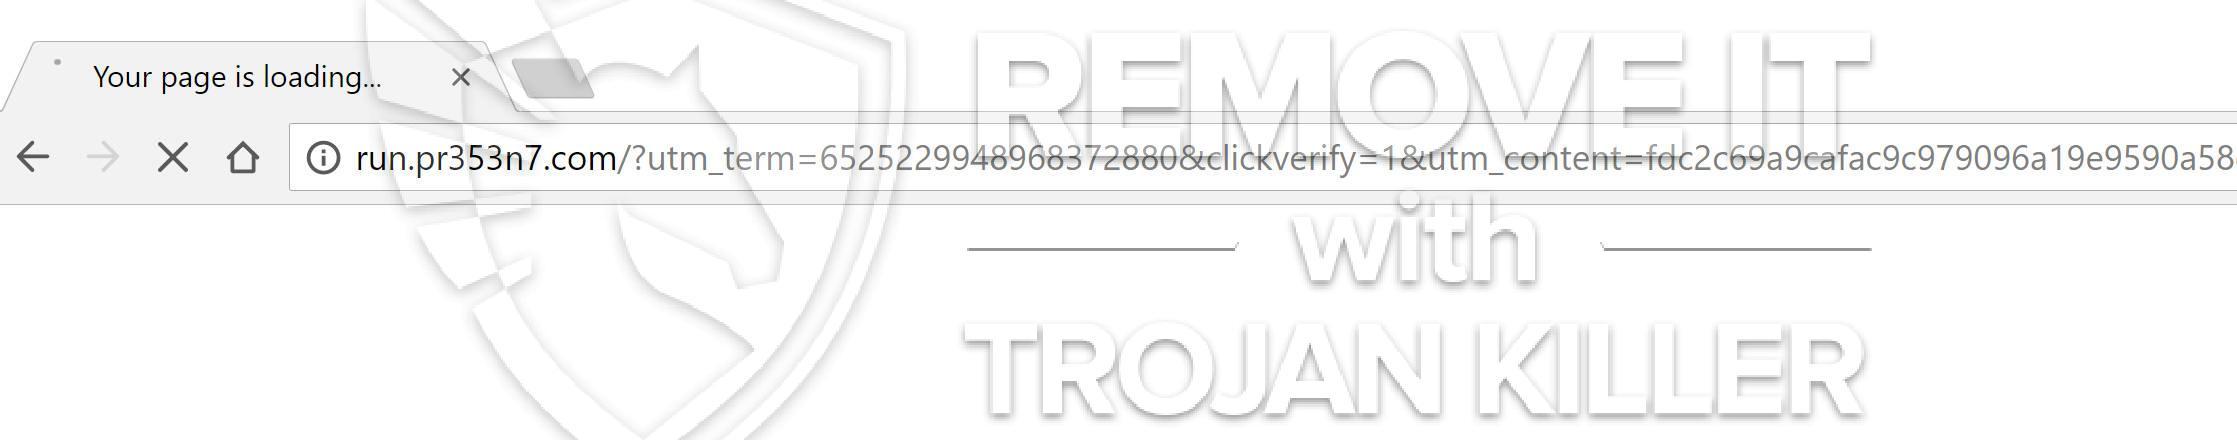 remove Run.pr353n7.com virus